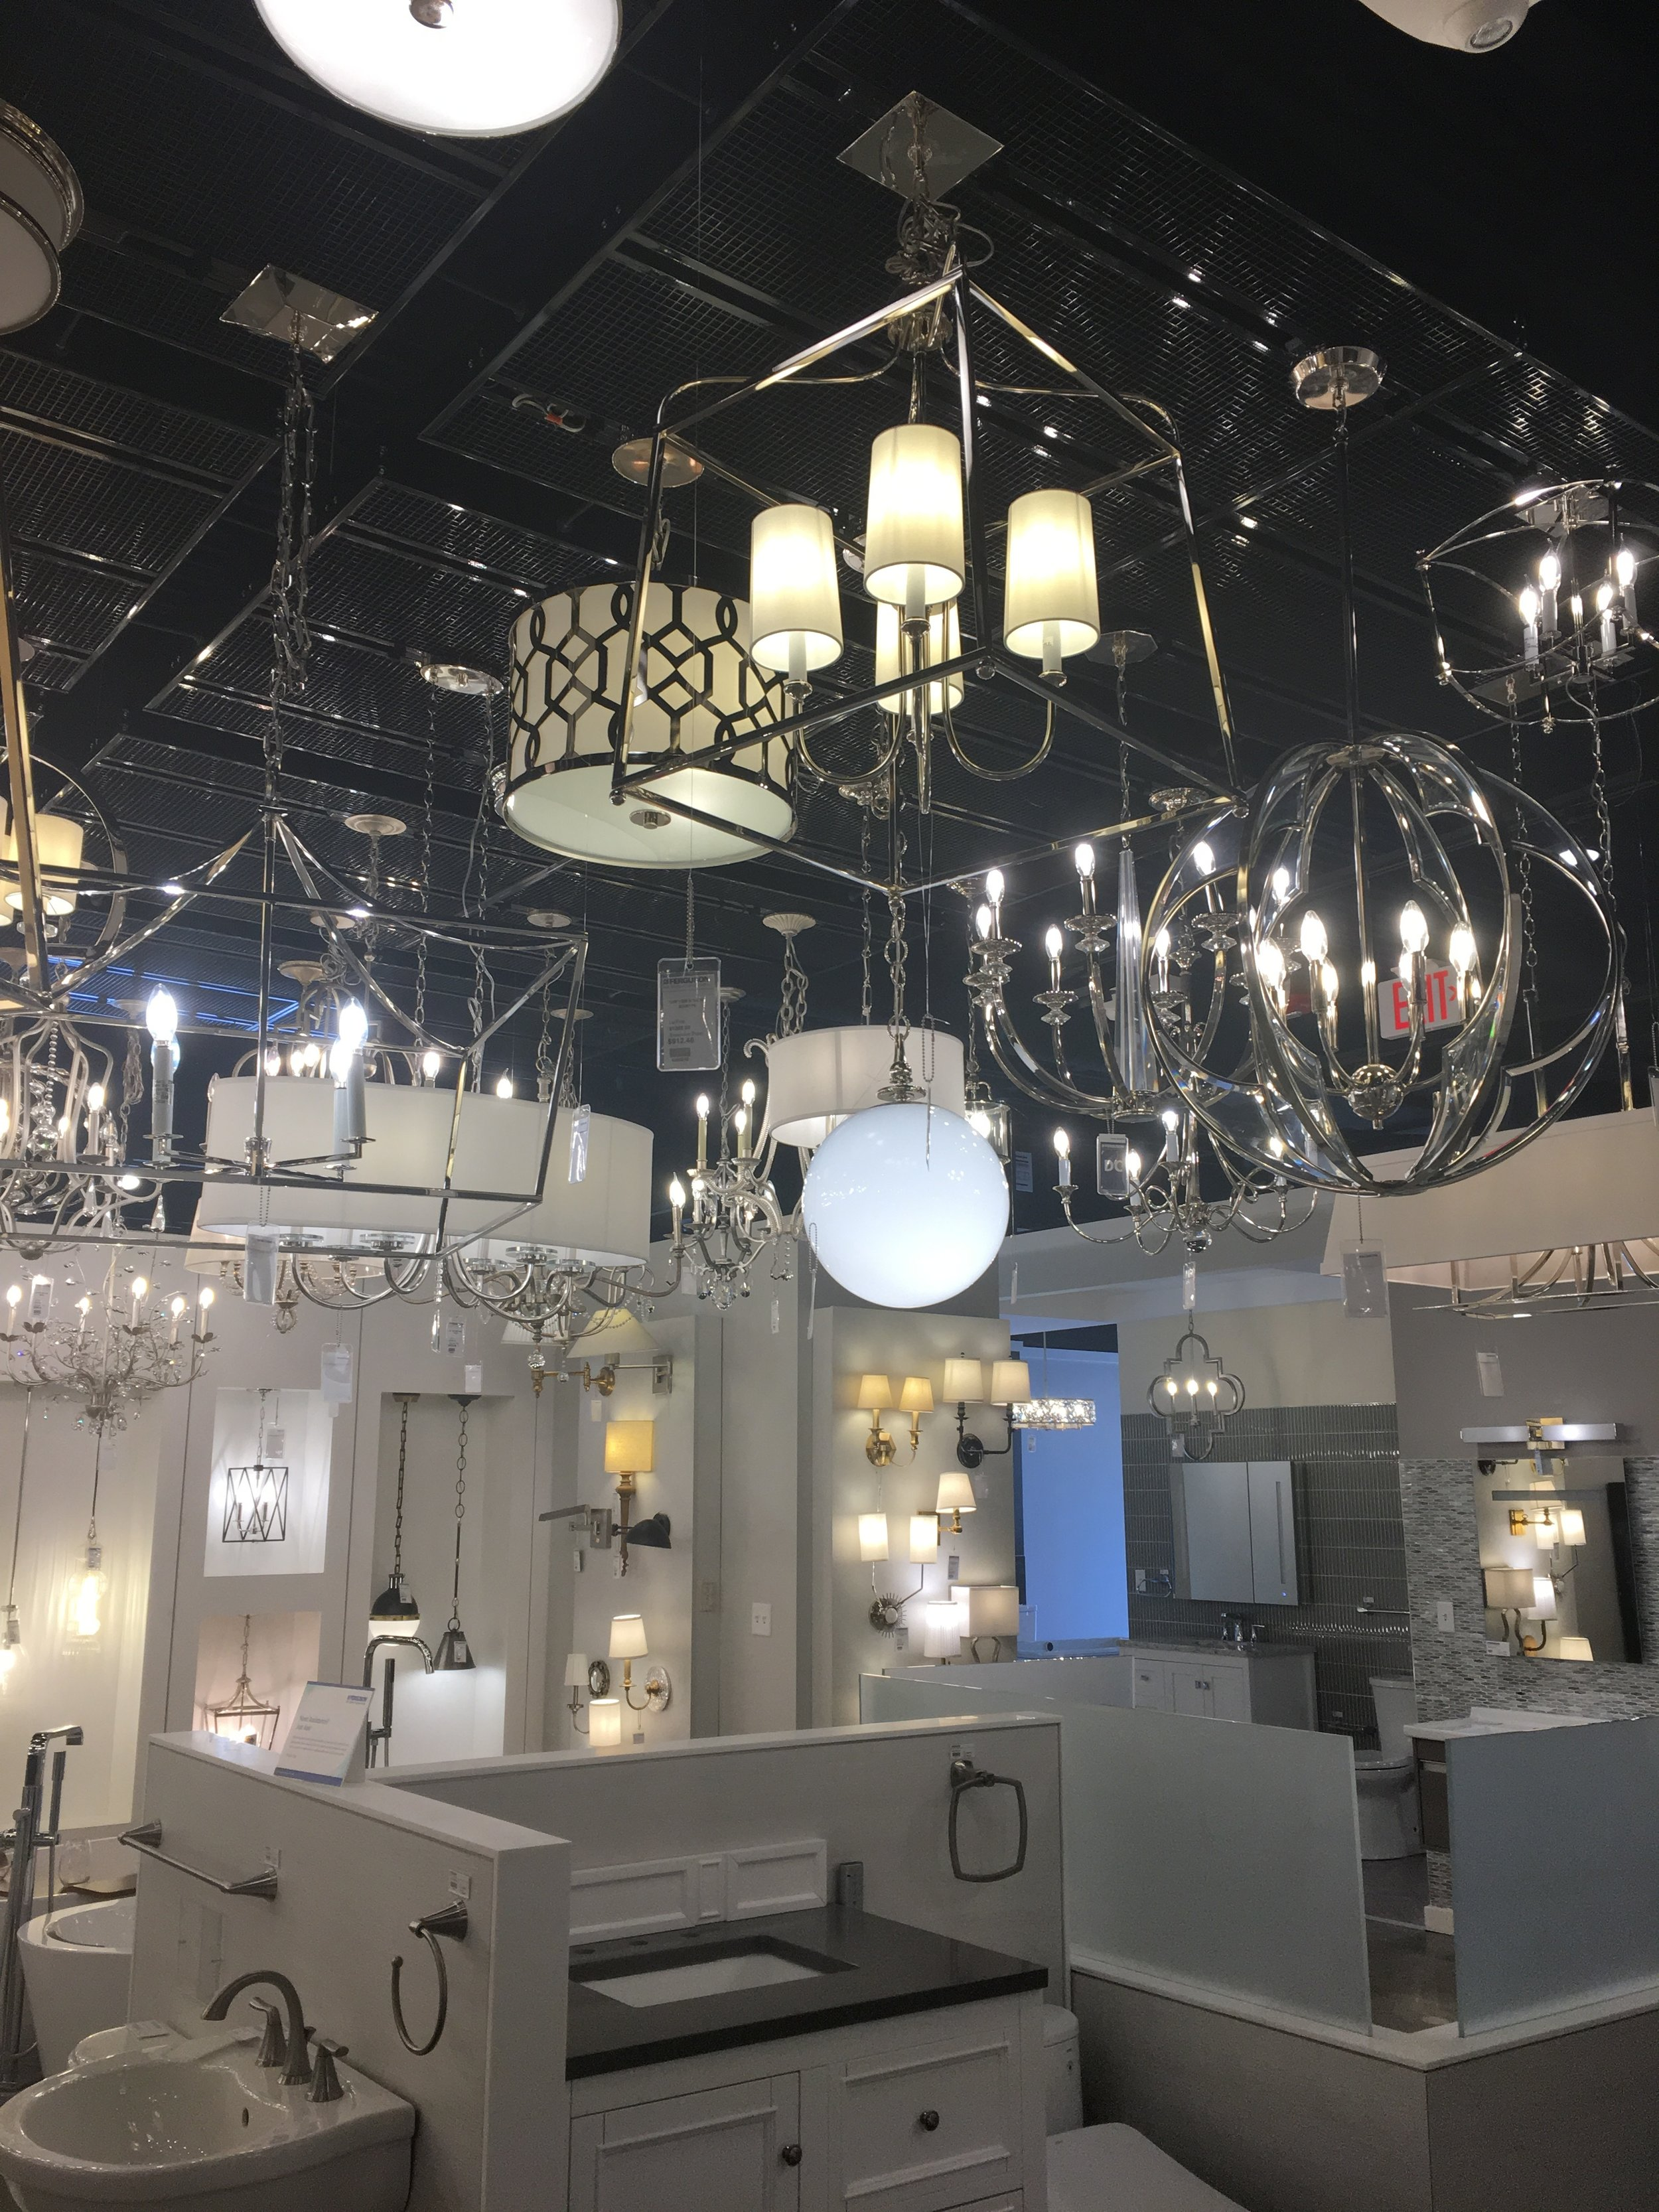 Lighting at Ferguson's Plumbing showroom, Burlington, MA